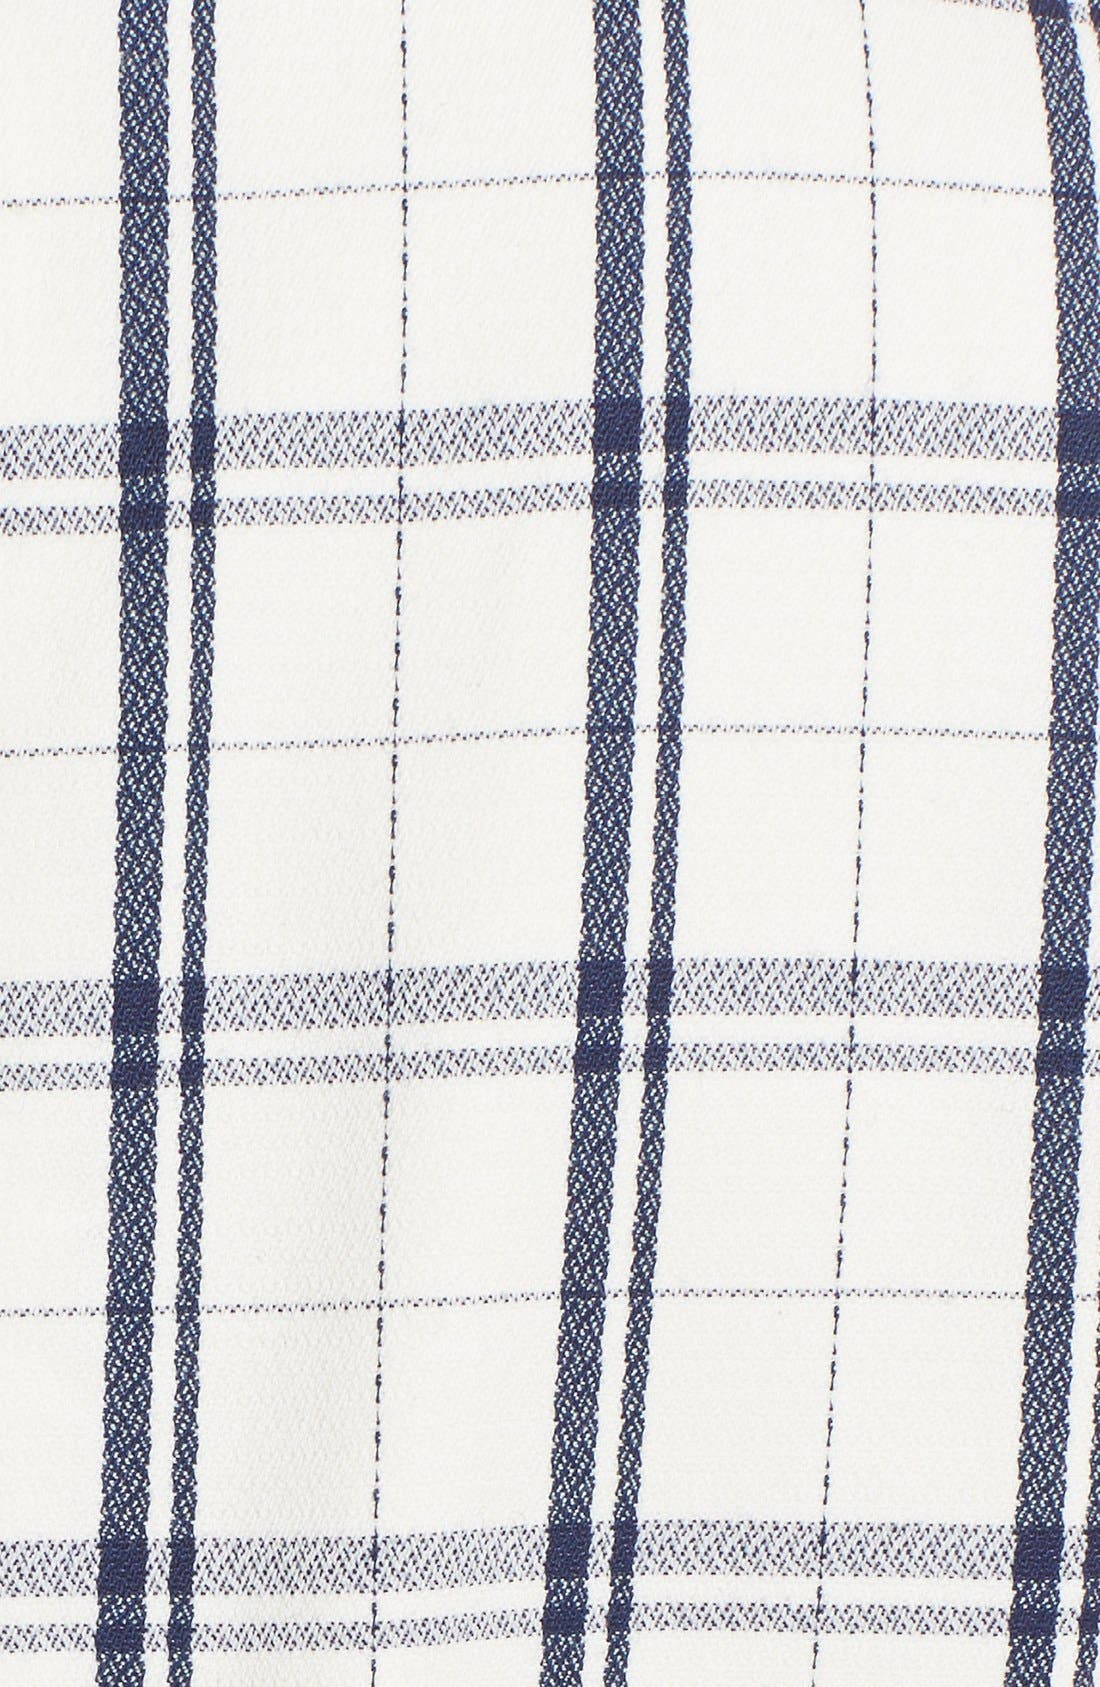 THEORY,                             'Adraya' Check Stretch Wool Shift Dress,                             Alternate thumbnail 3, color,                             900